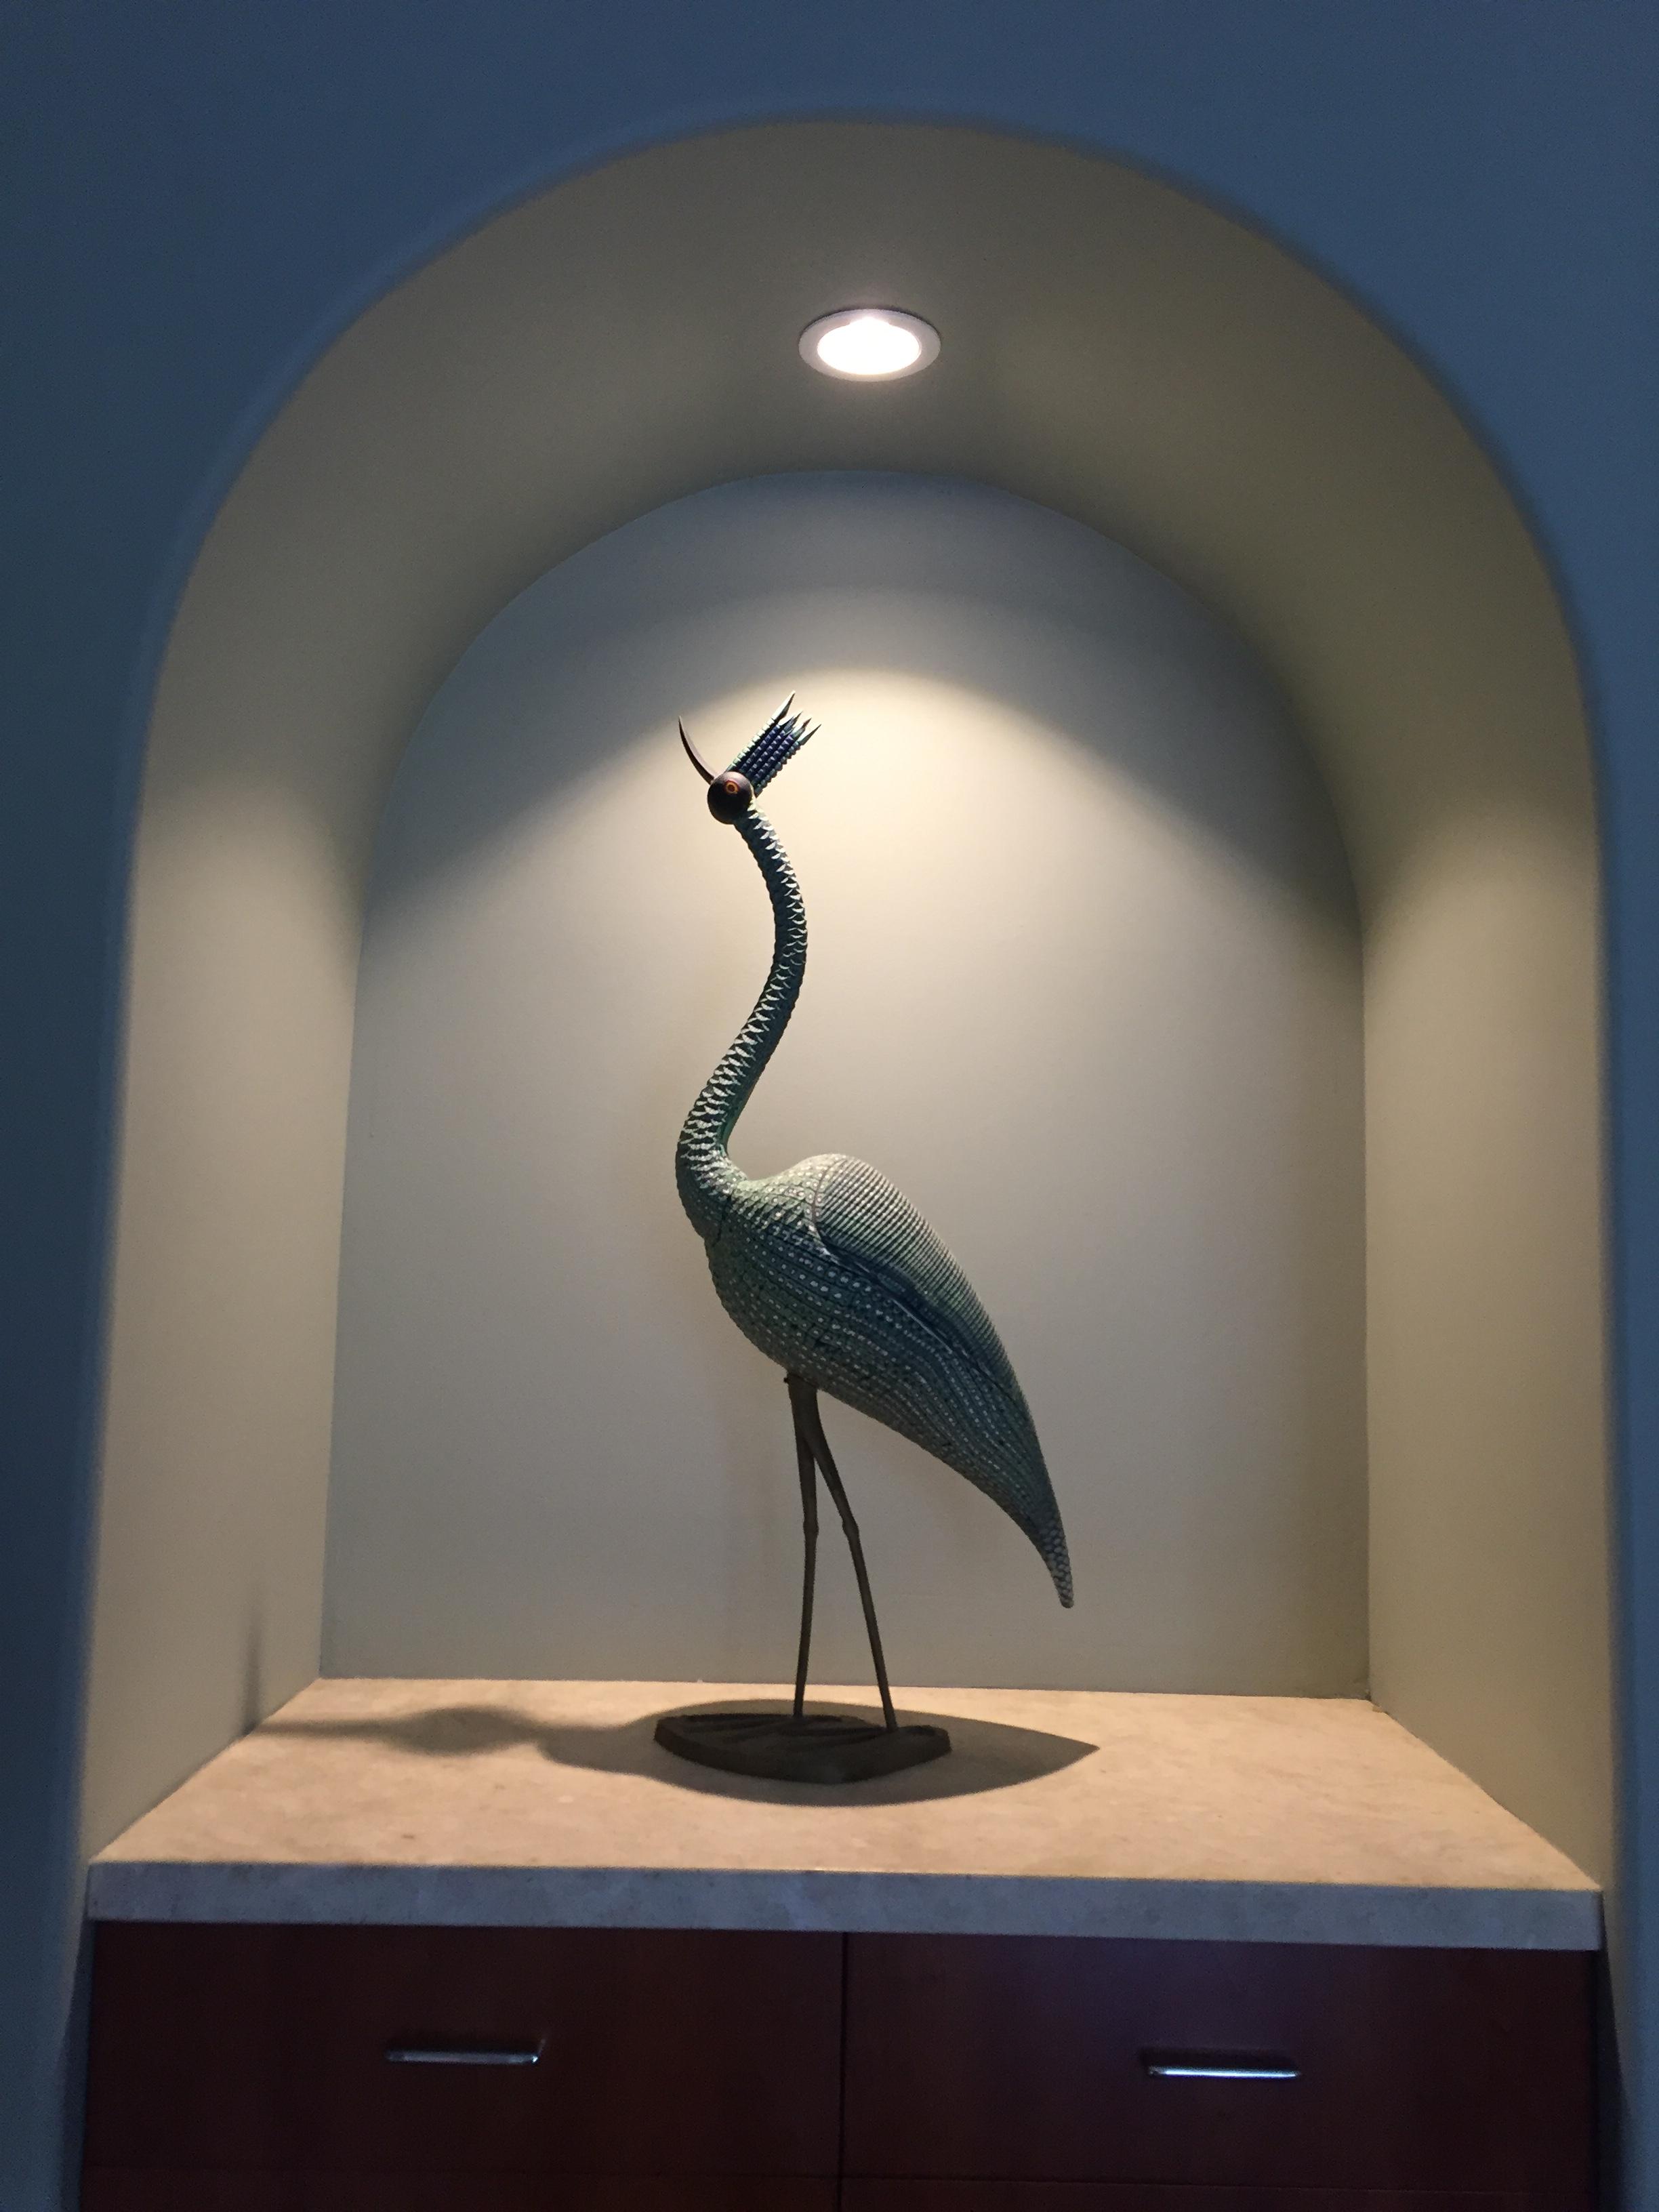 scultura-vetro-schiavon-venezia